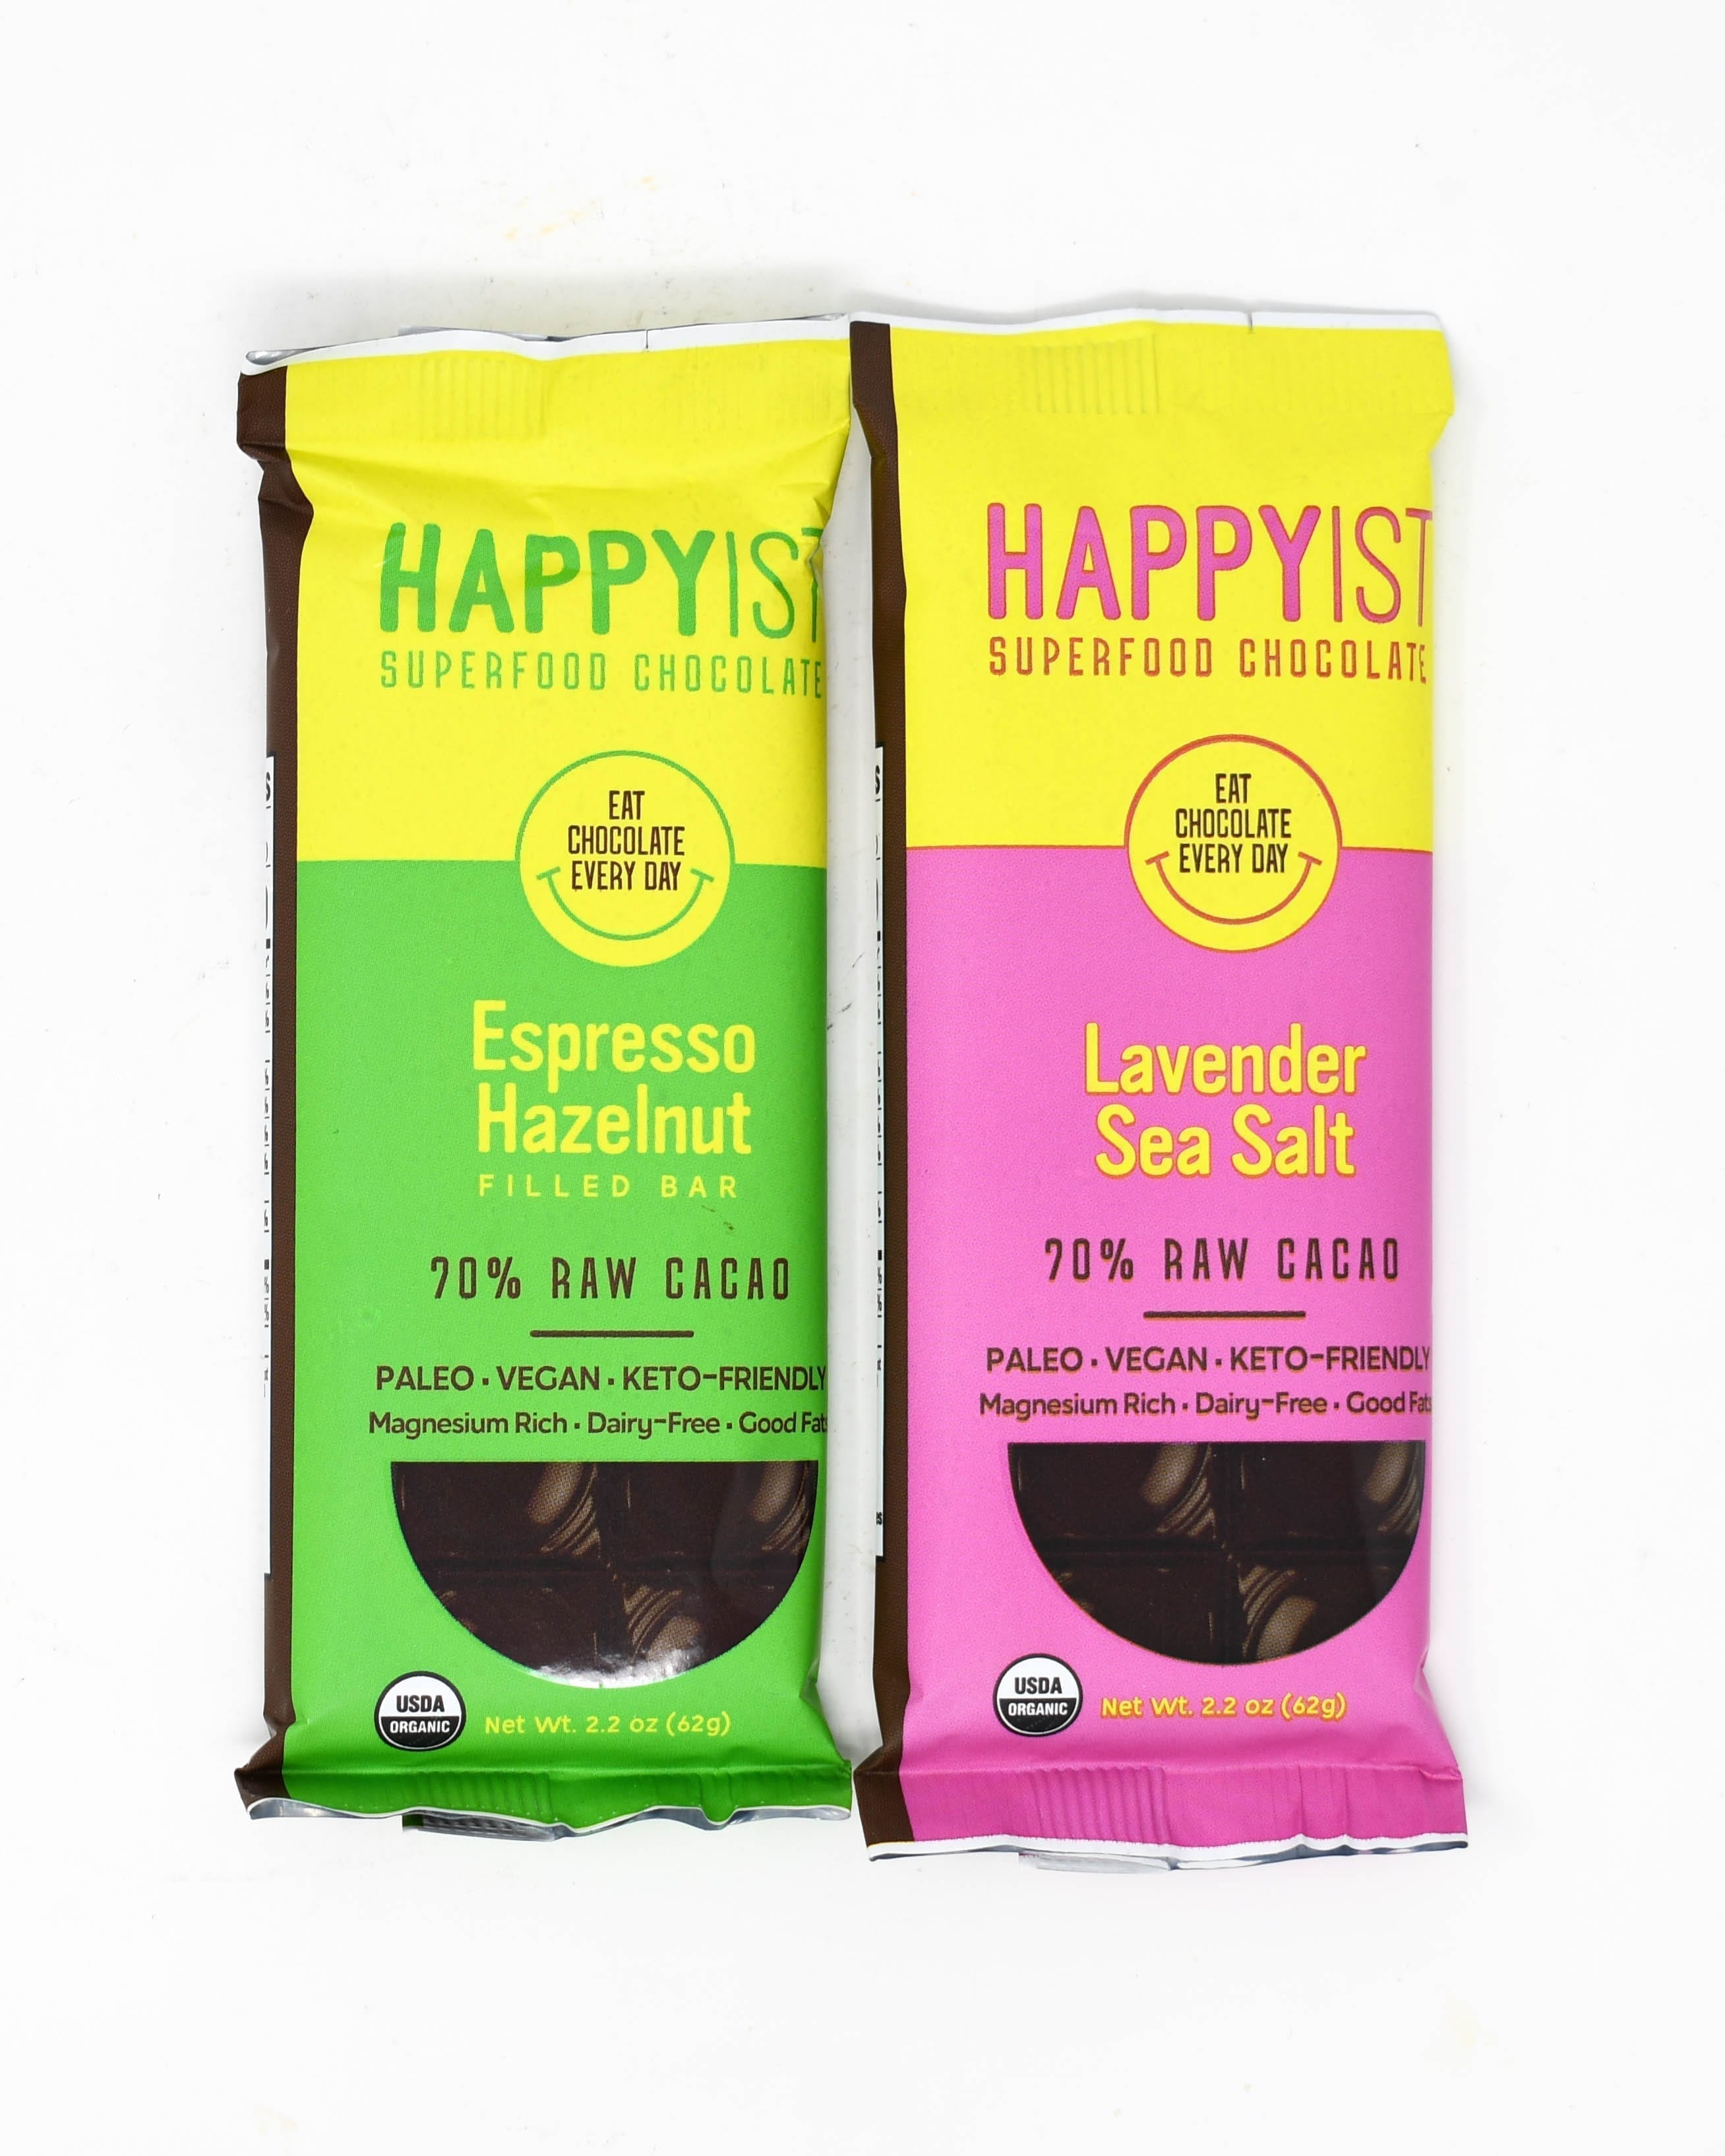 Happyist Chocolate